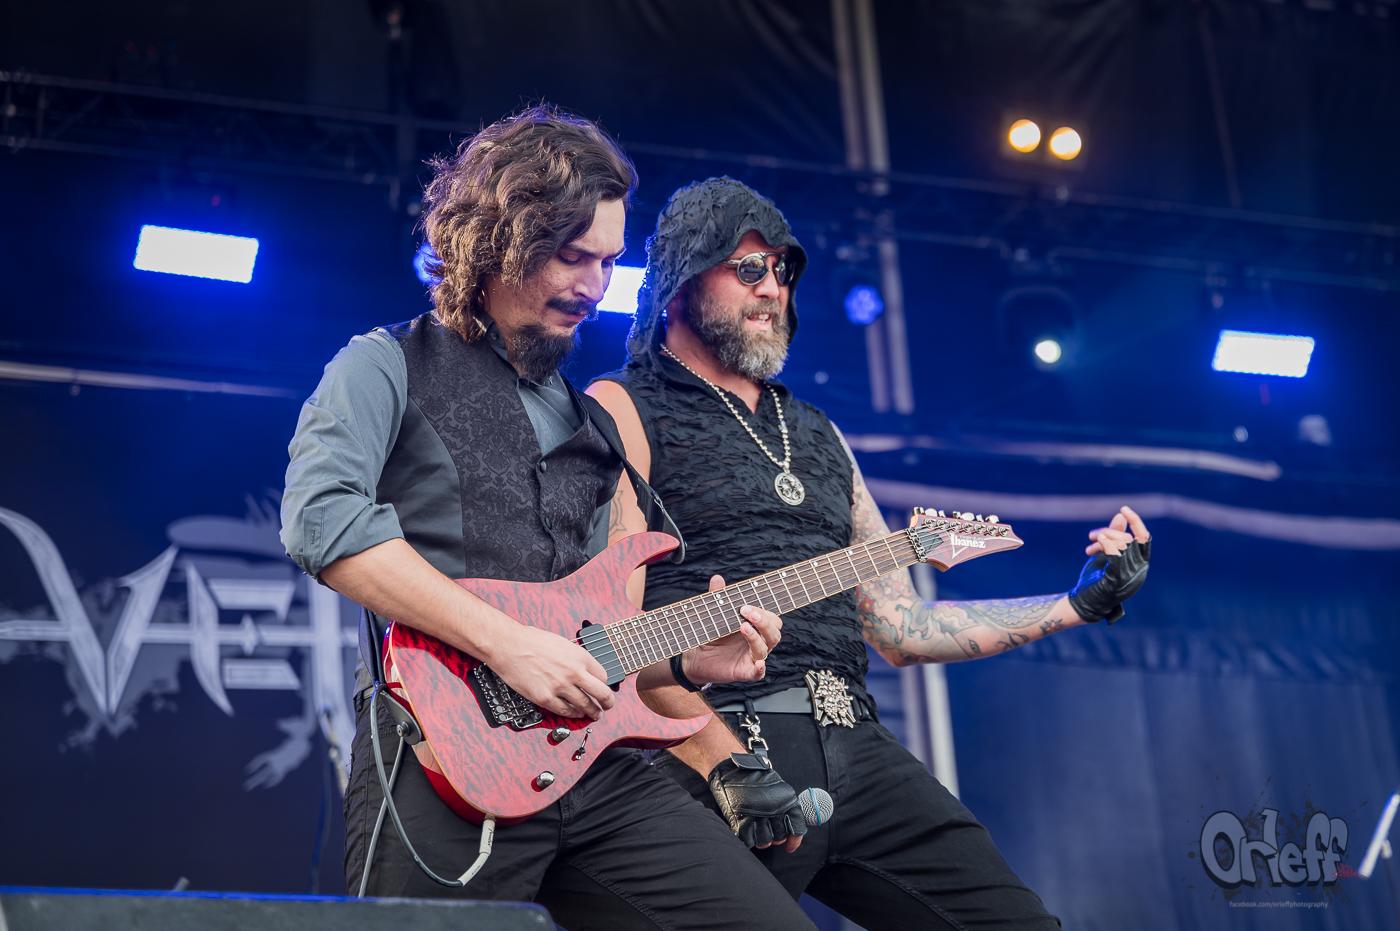 Velian @ Varna Rock Fest, 2019